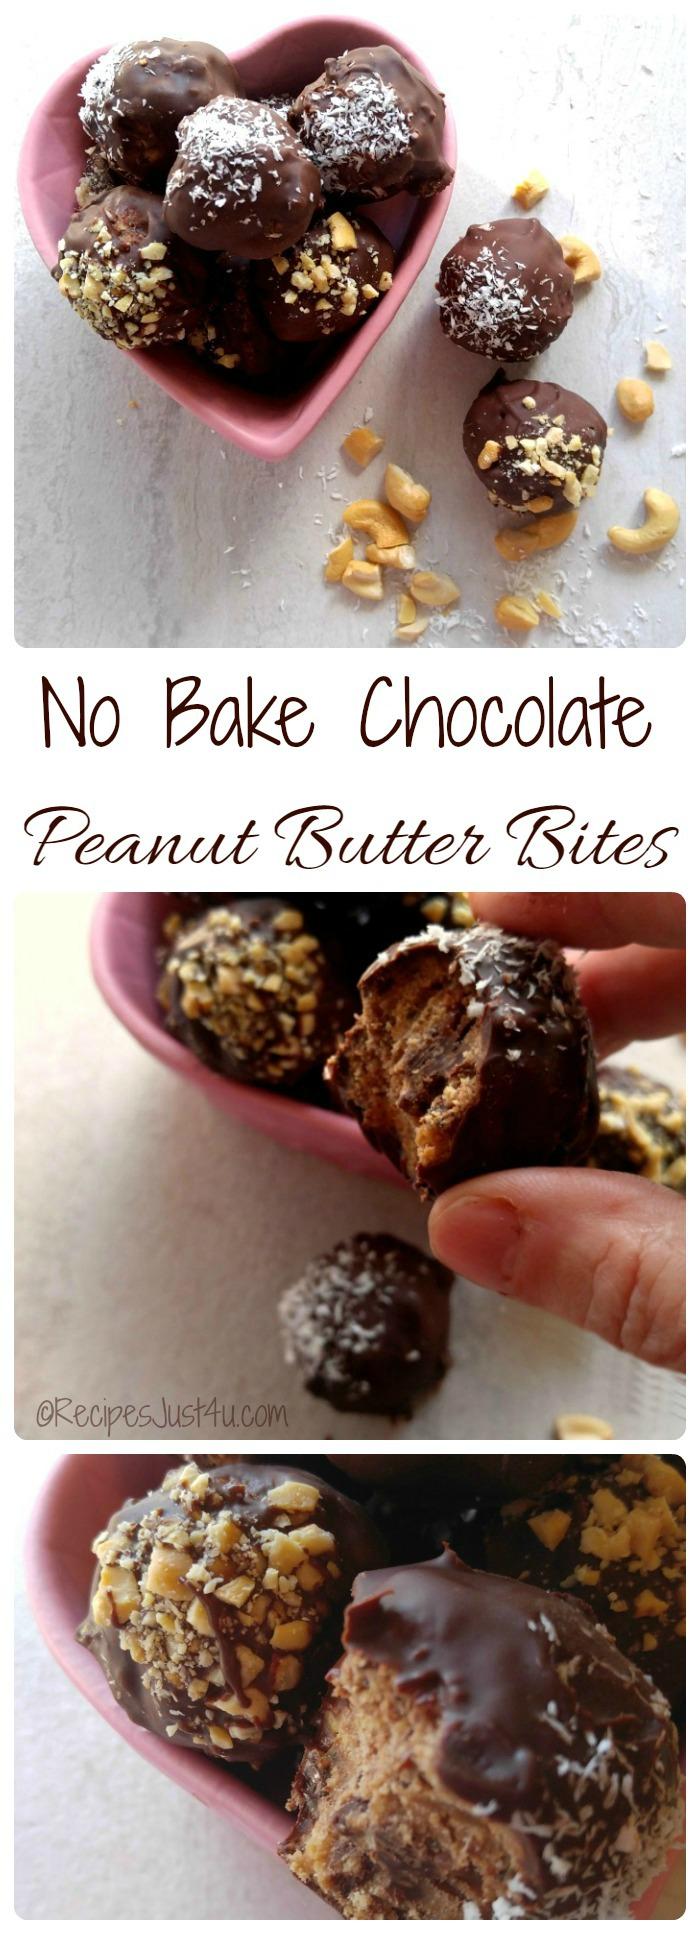 DChocolate Peanut Butter Bites